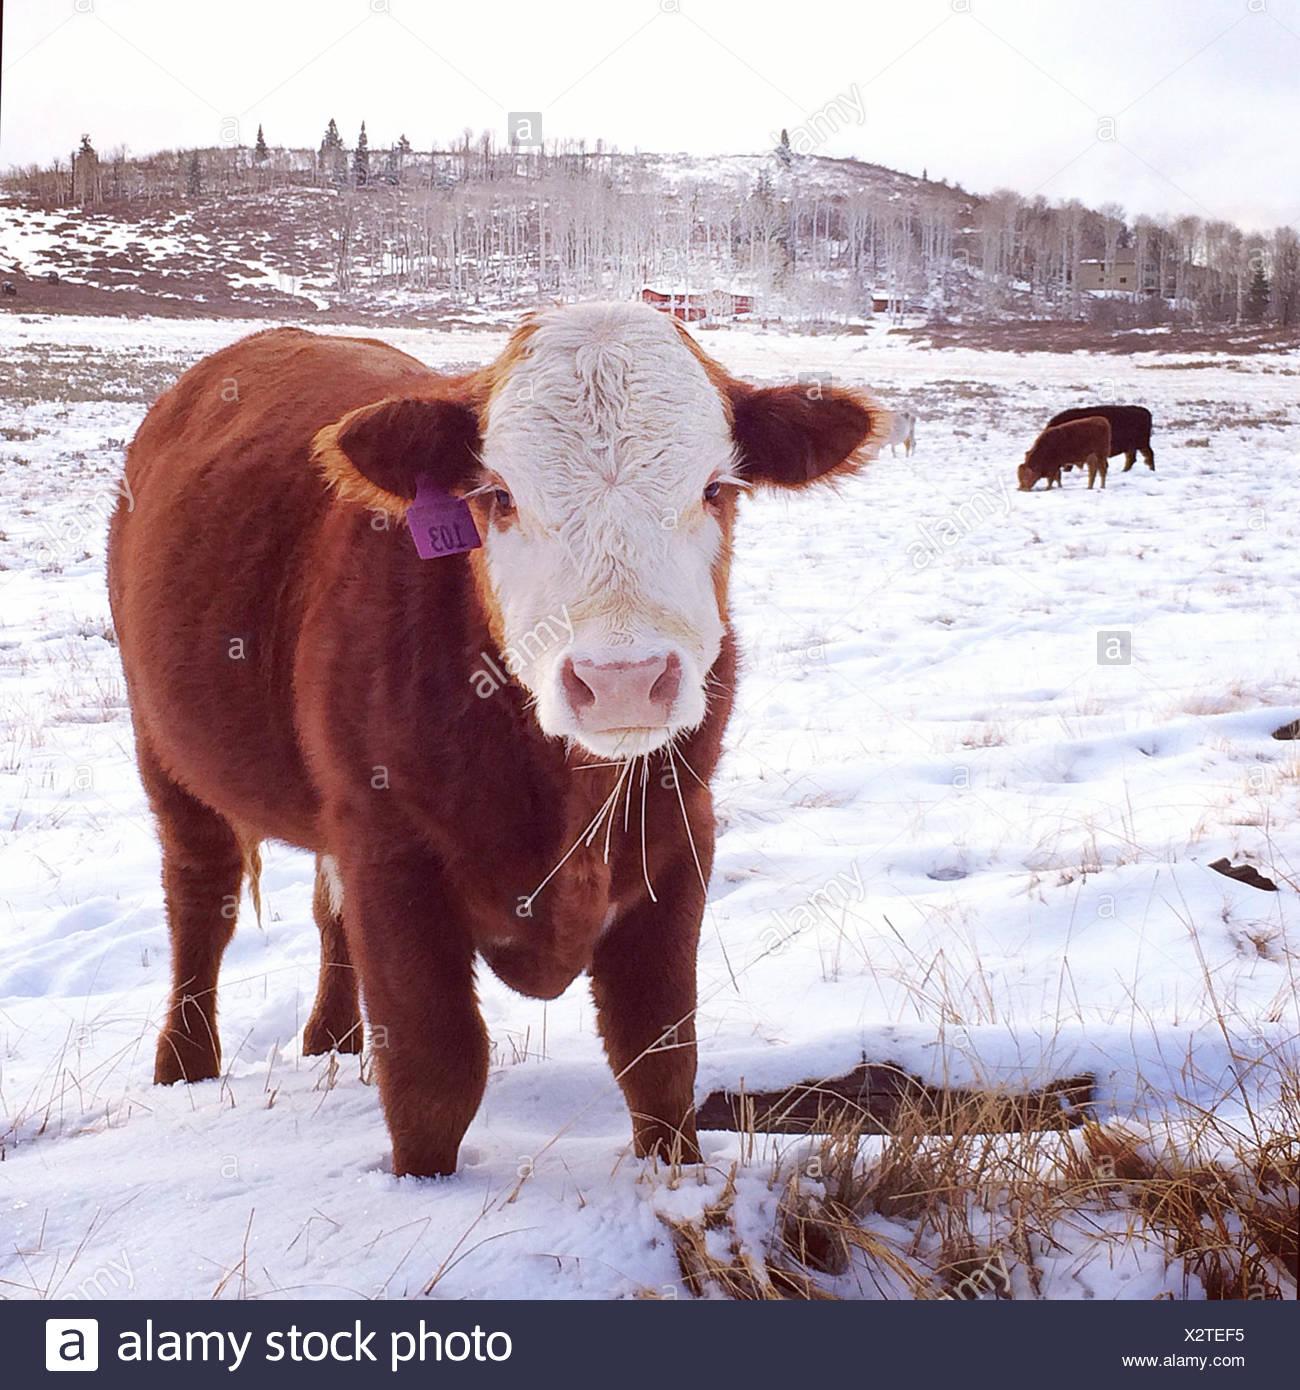 Cow standing in field in snow, Springdale, Utah, America, USA - Stock Image